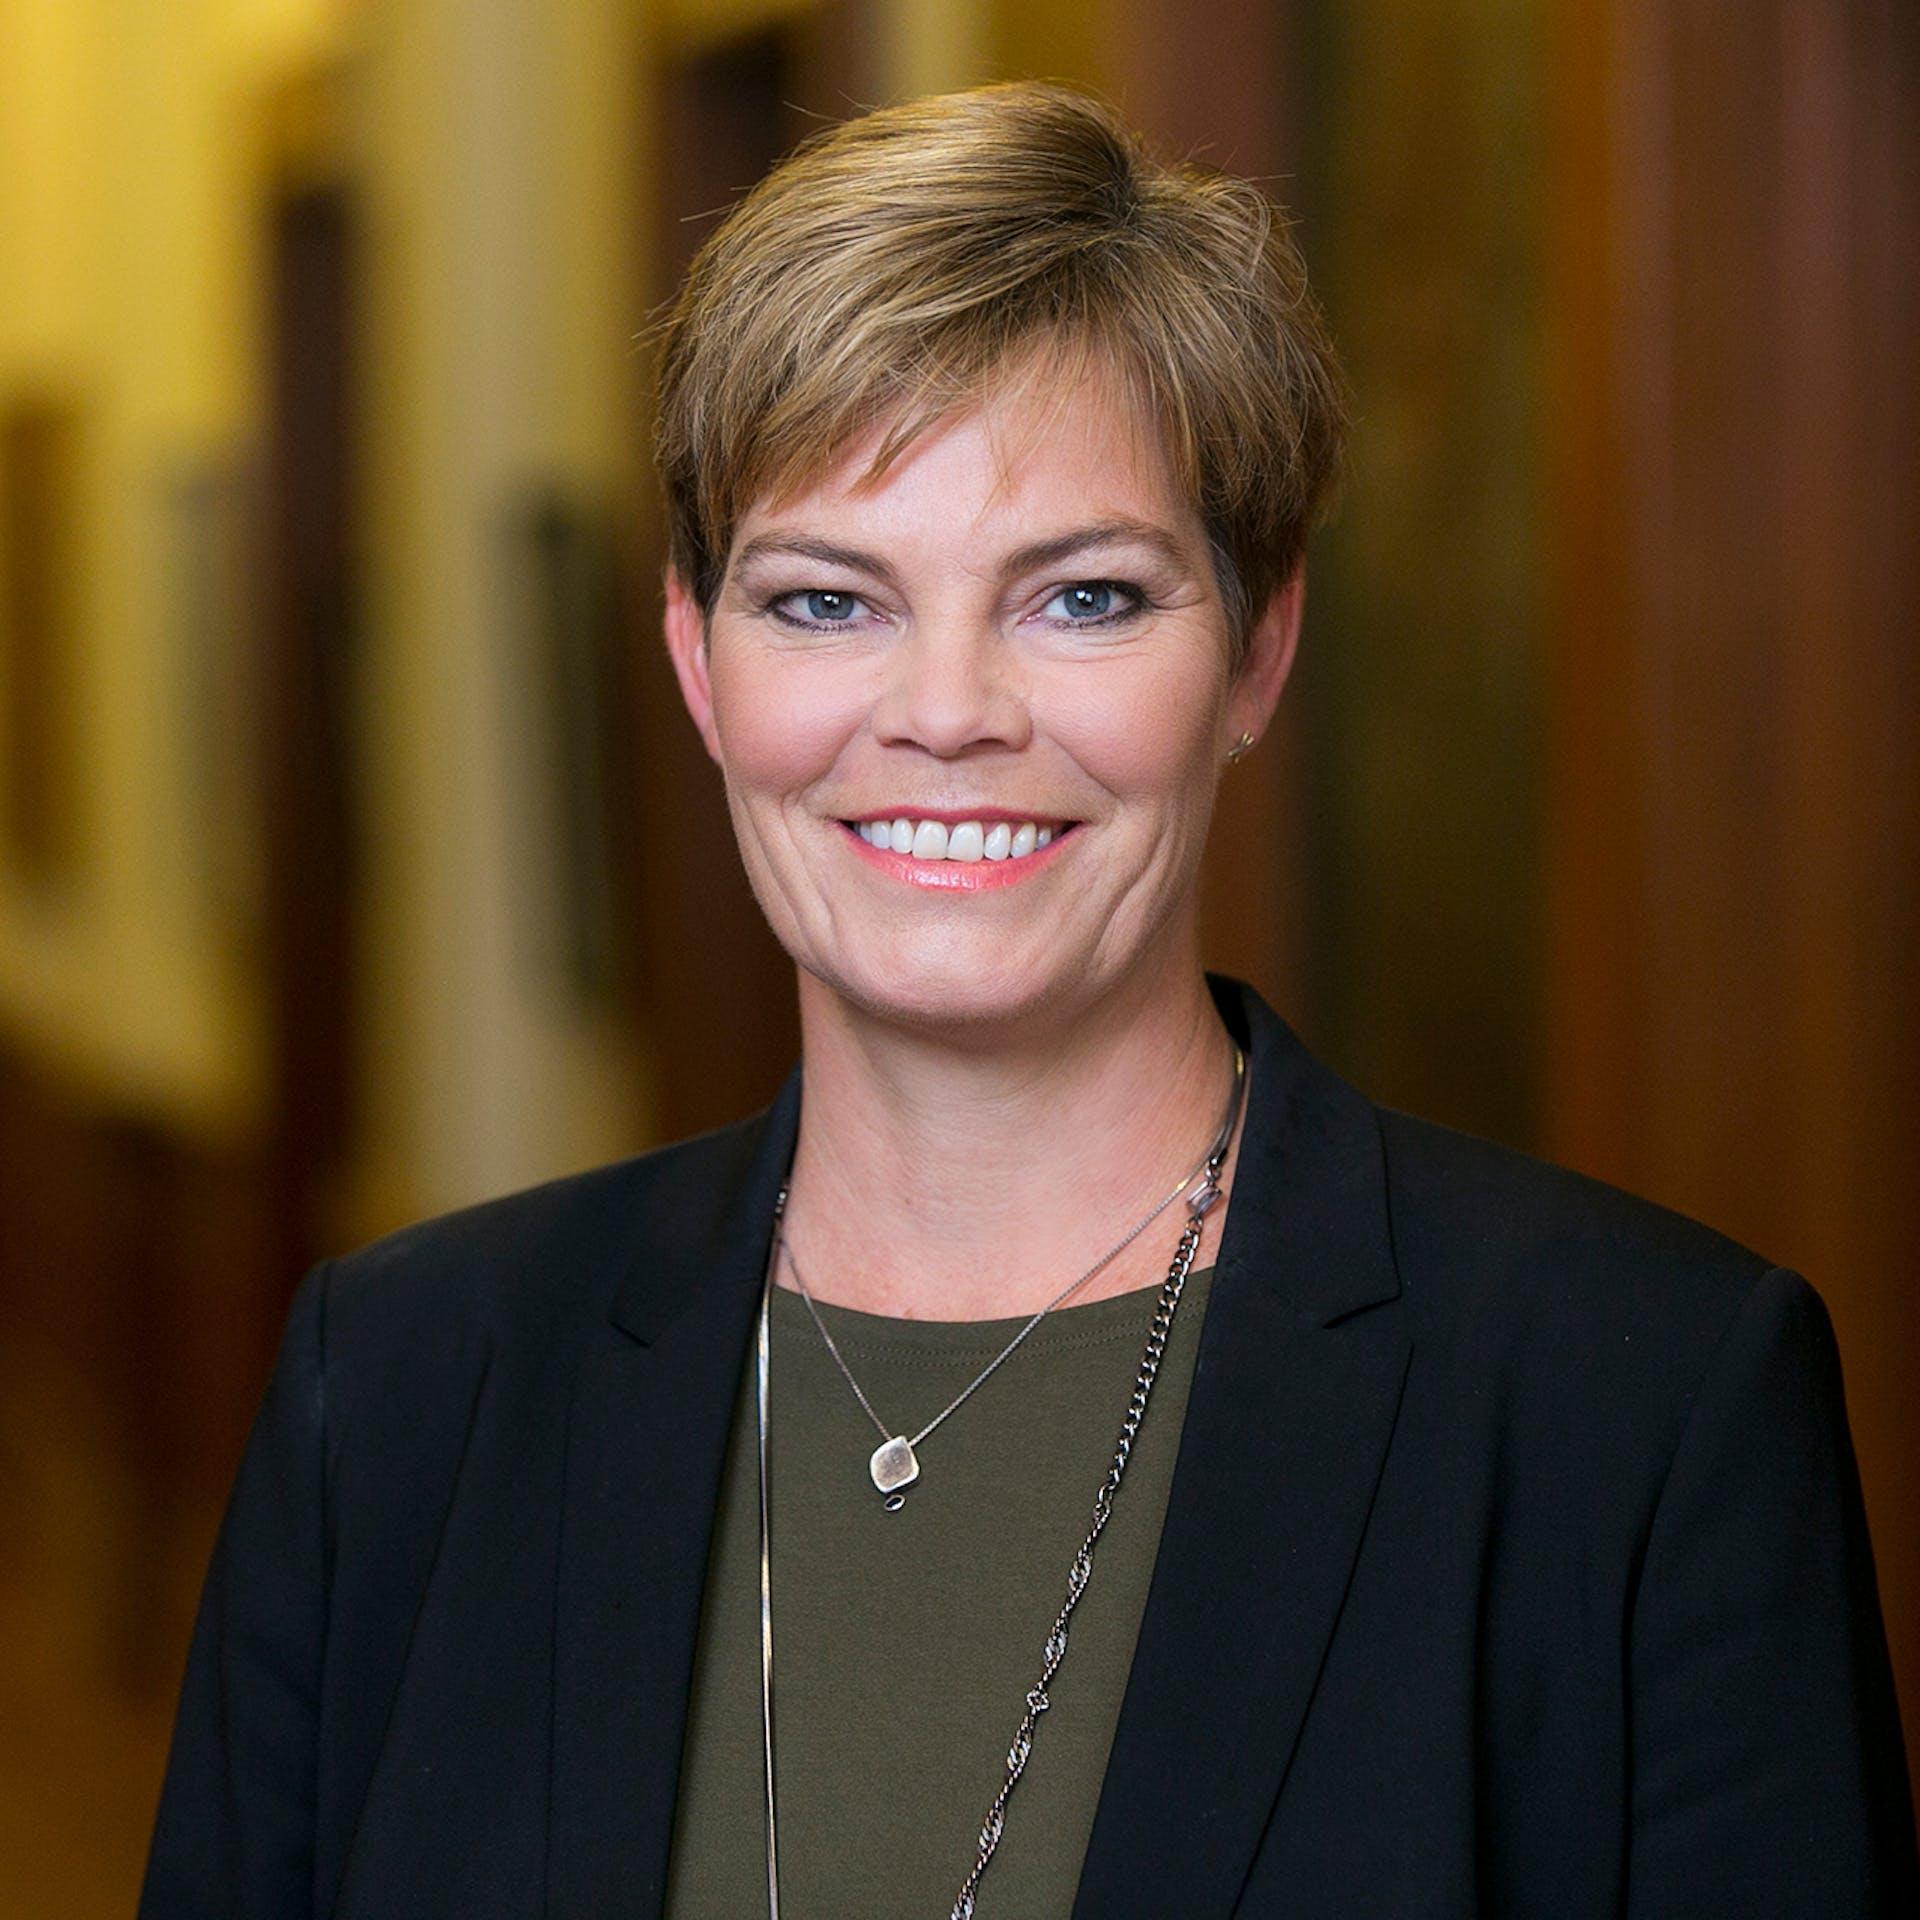 Berglind Svavarsdóttir, vice-chairman